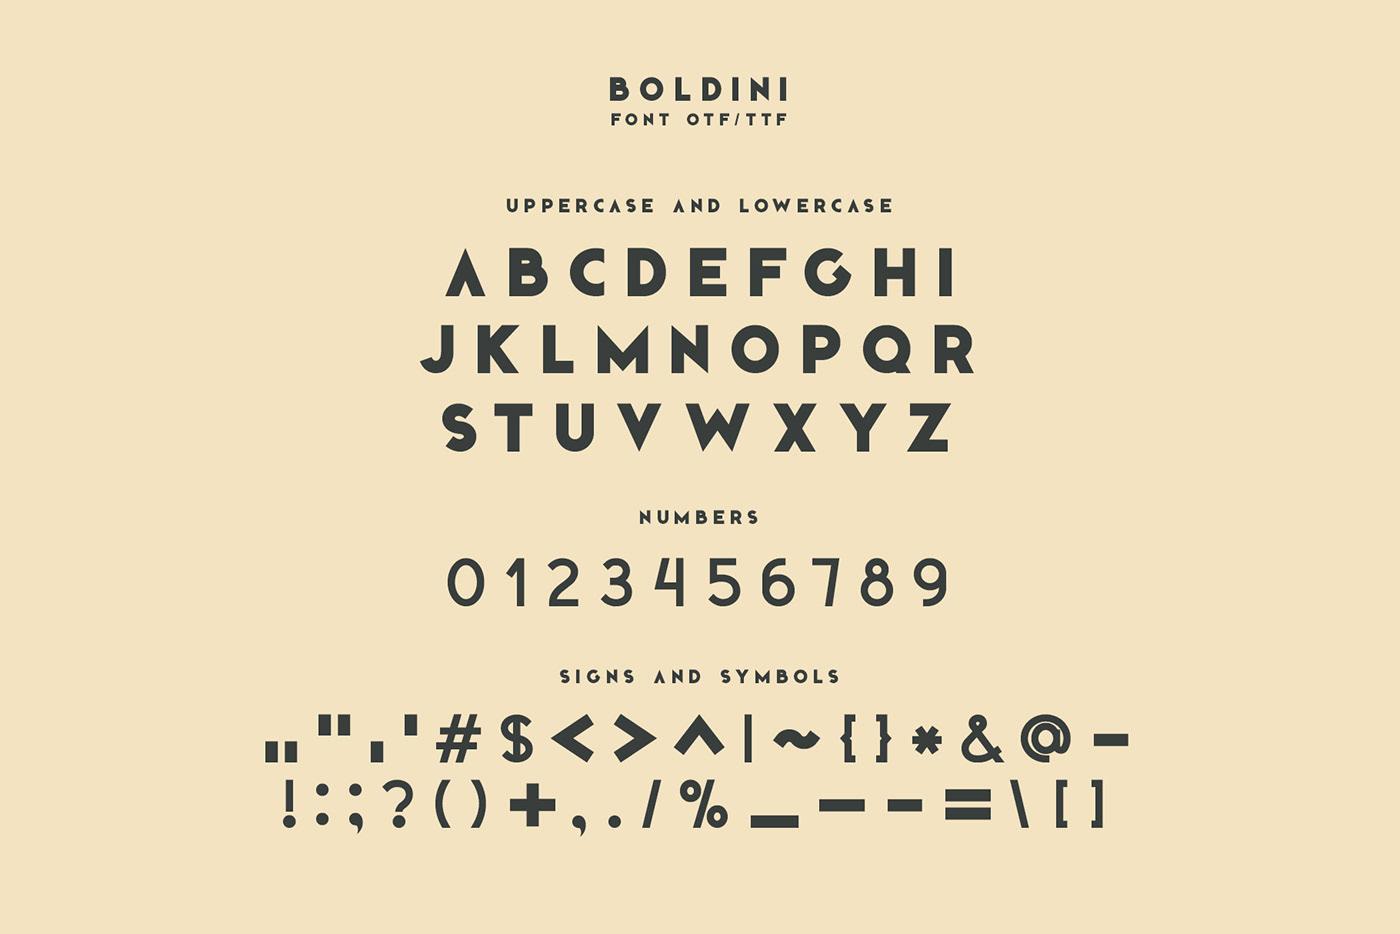 Boldini font family otf svg type typography   Web sans serif desktop